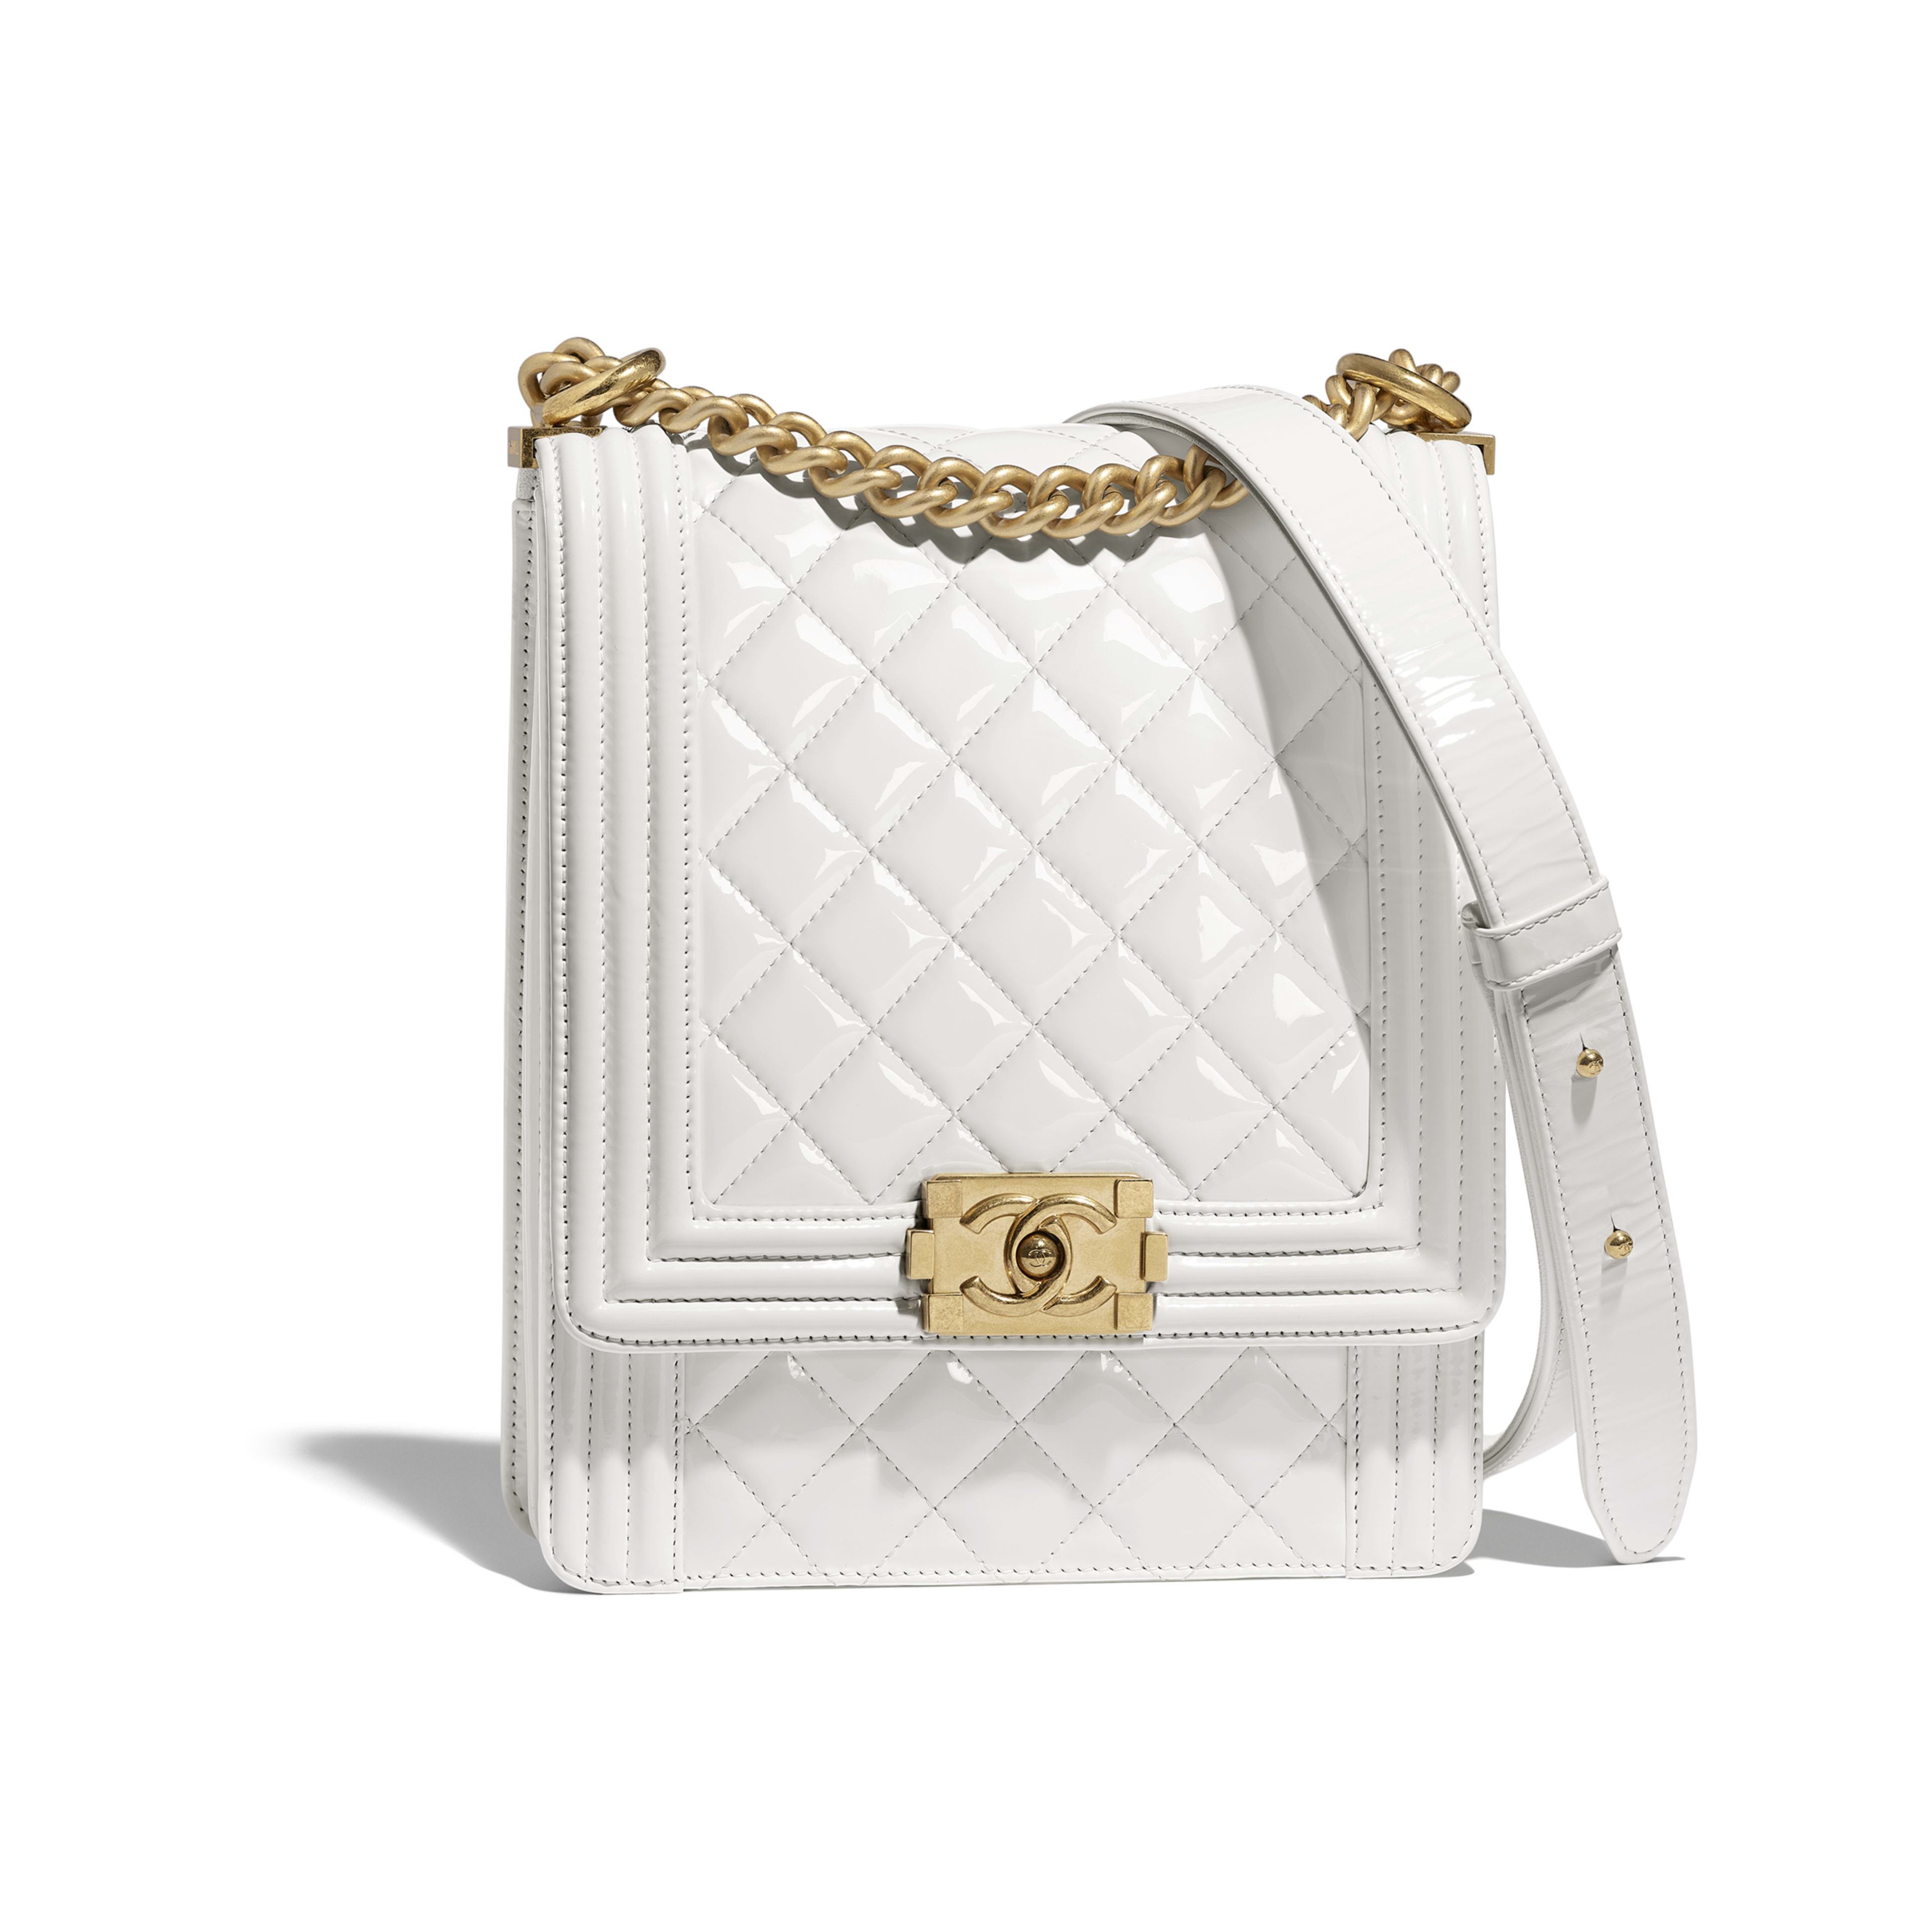 af6396111f97f BOY CHANEL Handbag - White - Patent Calfskin   Gold-Tone Metal - Default  view ...